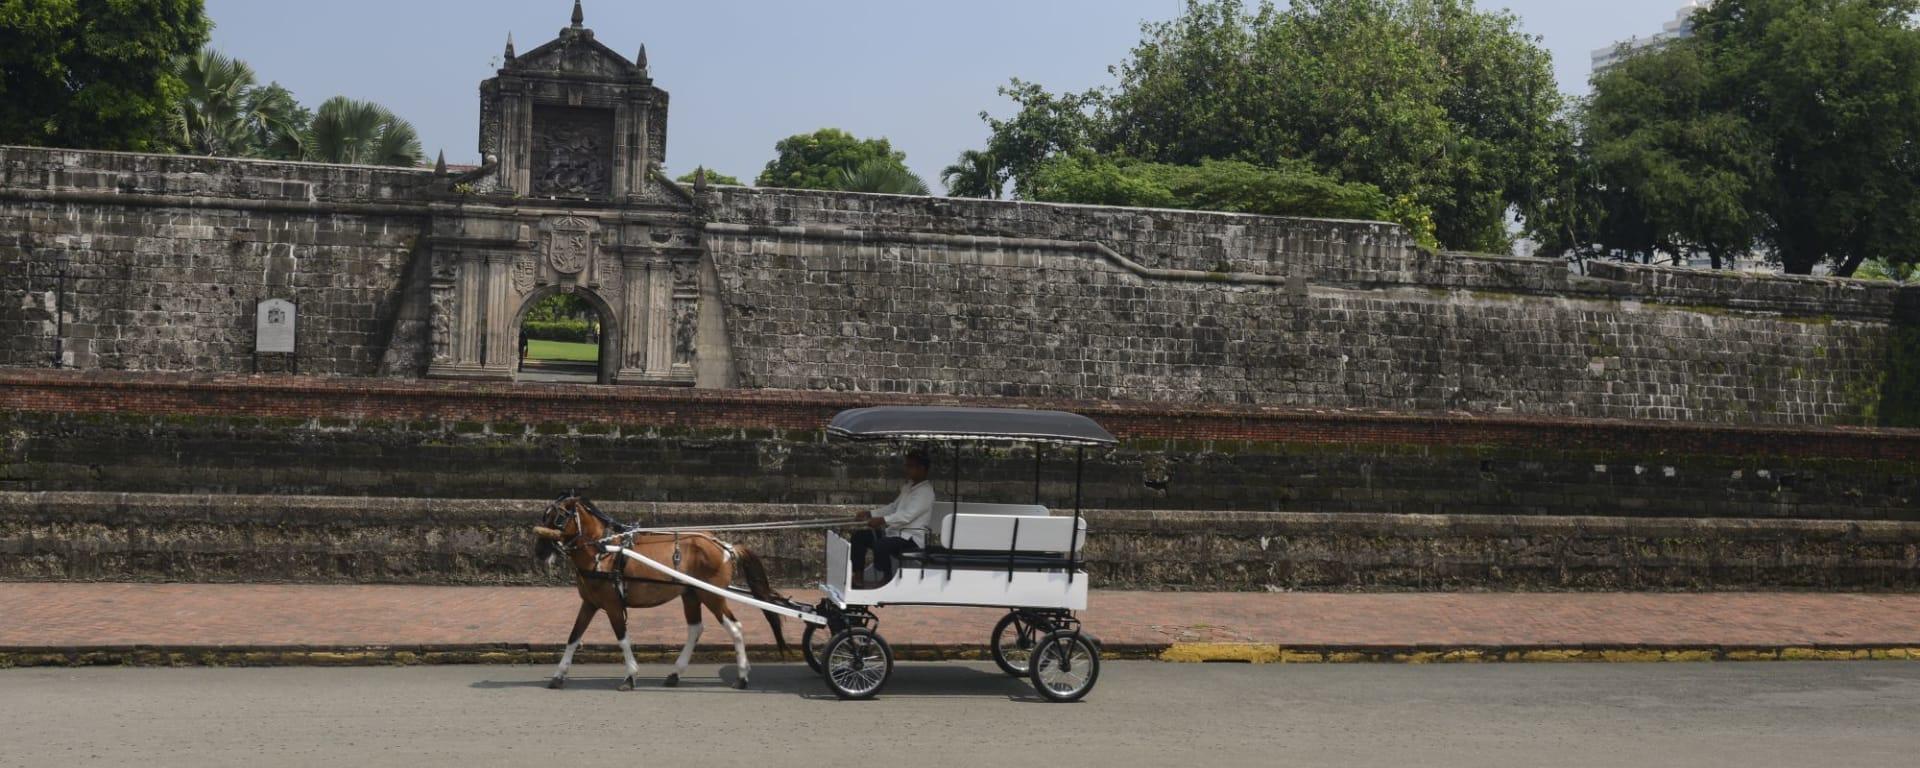 Tour de ville de Manille, demi-journée: Manila Intramuros